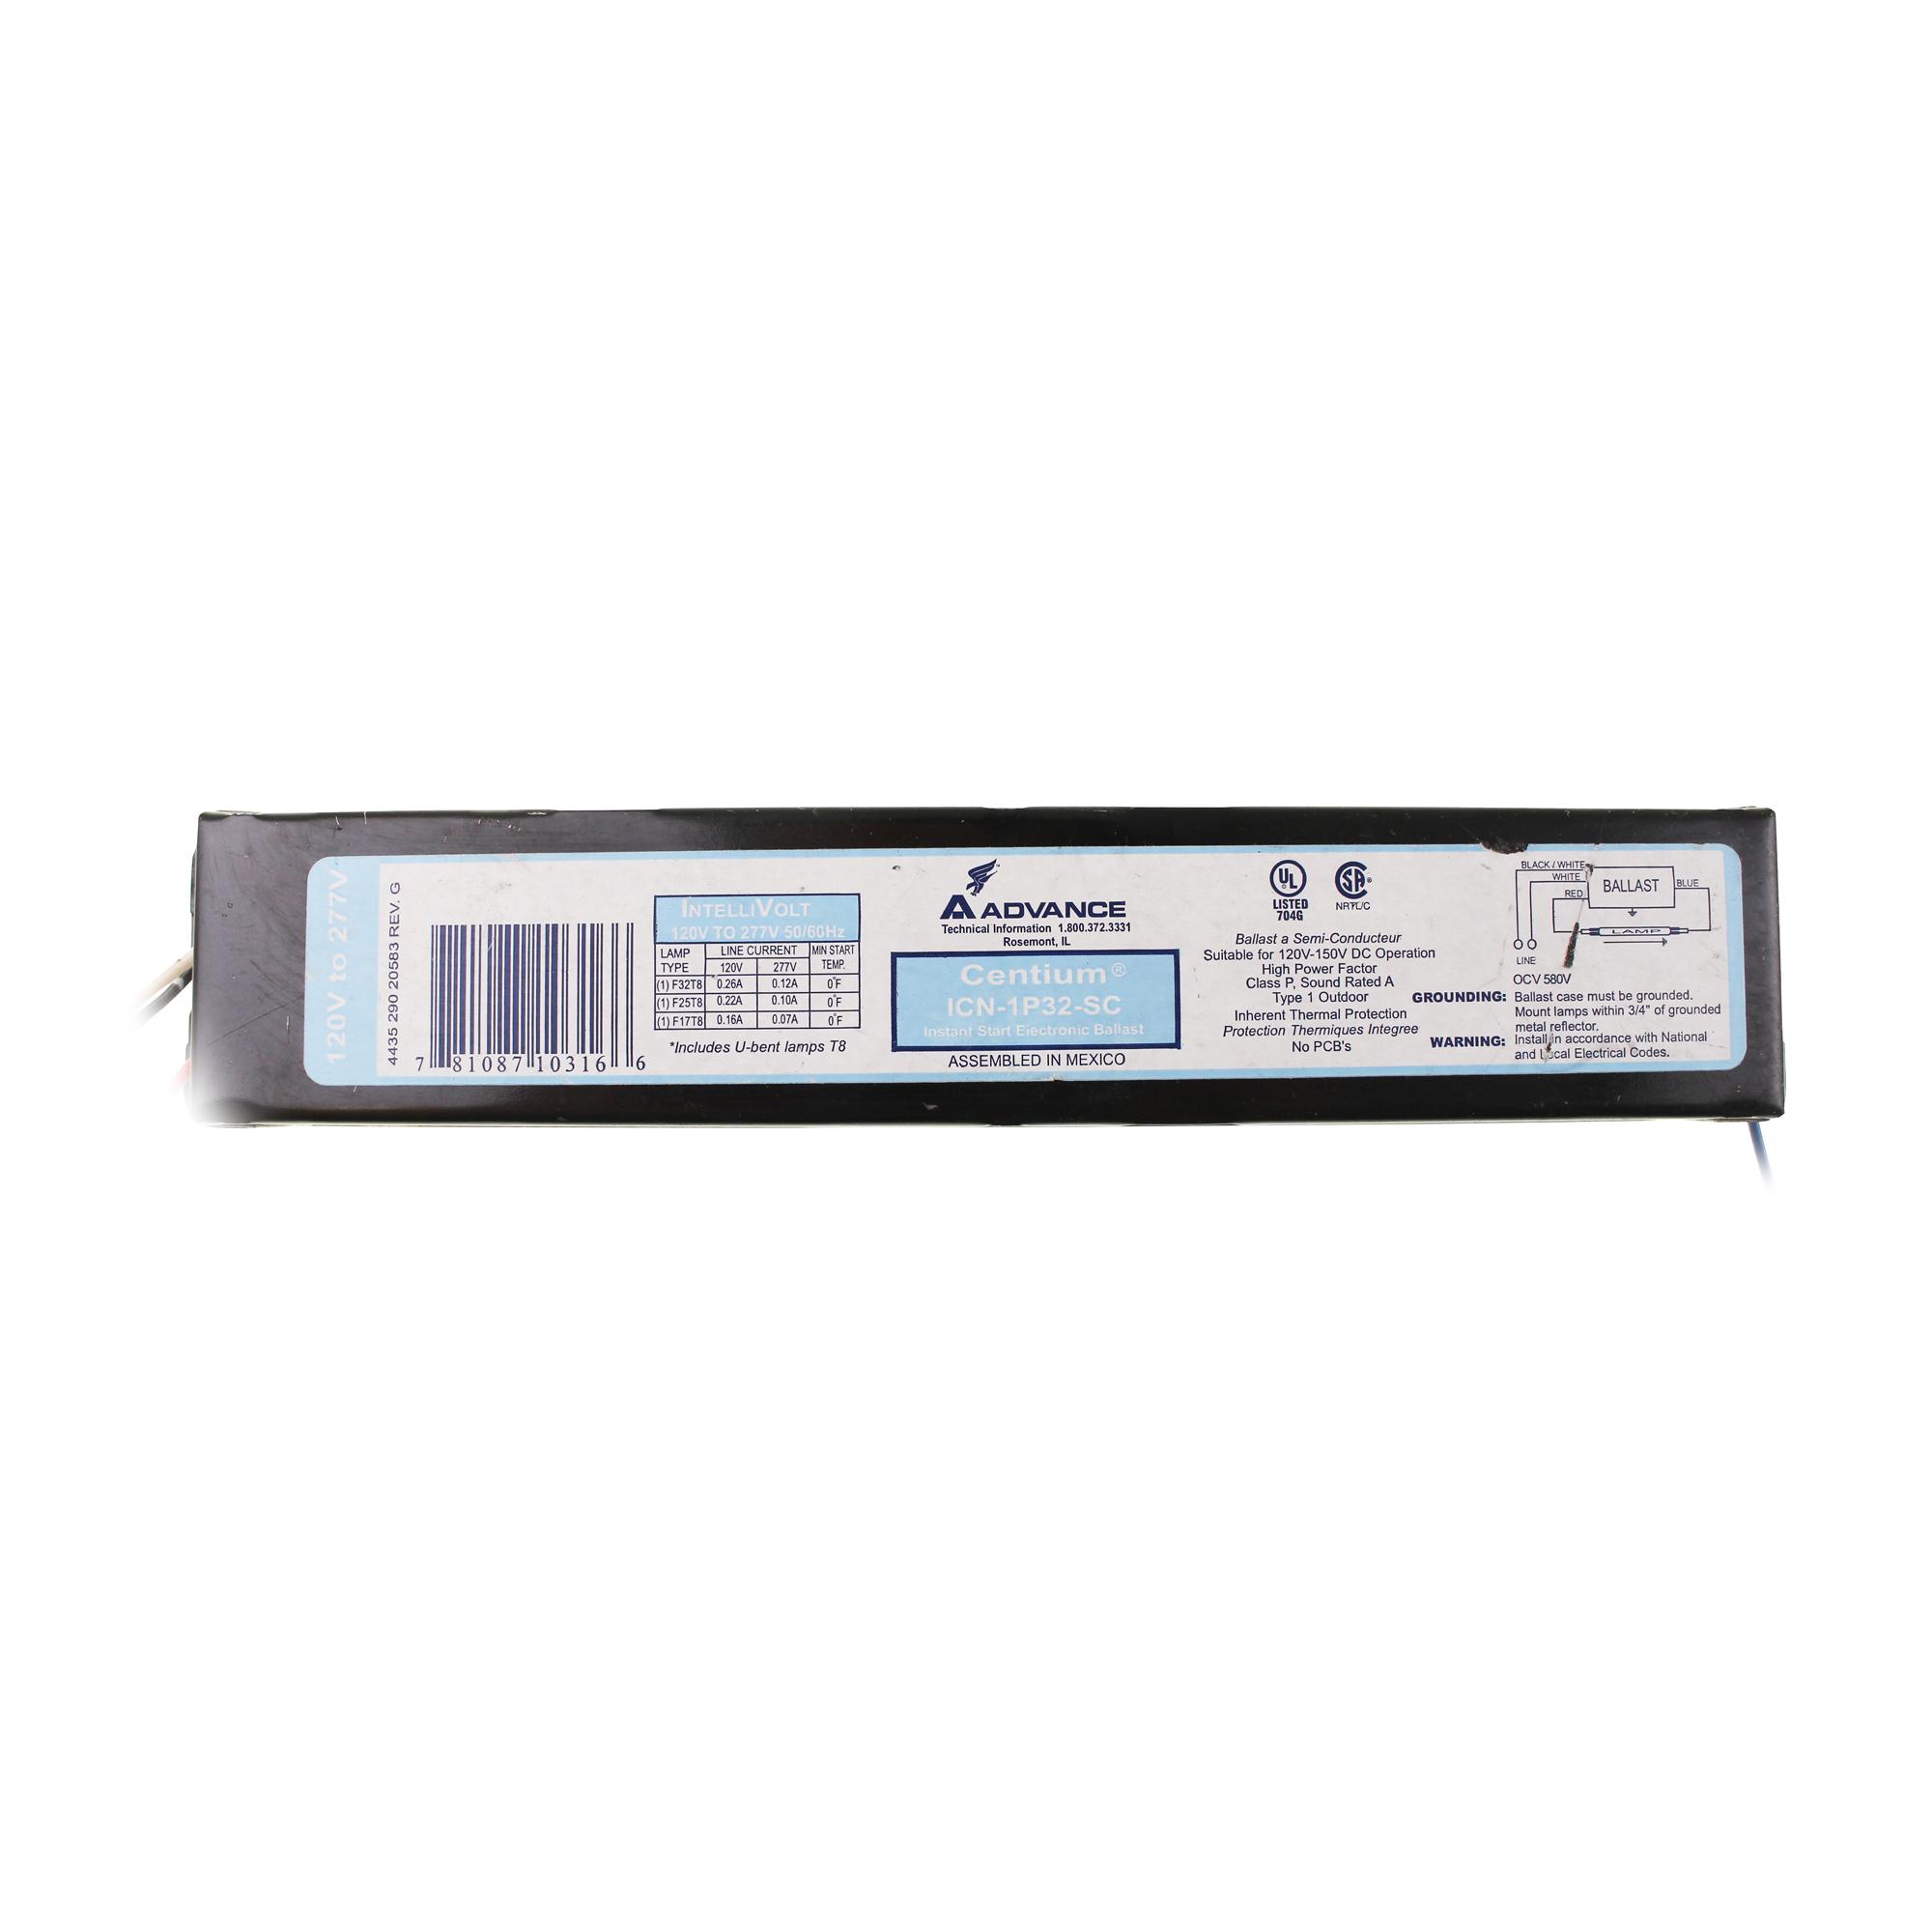 advance t8 ballast wiring diagram faria marine gauges icn 1p32 sc electronic fluorescent 1 lamp